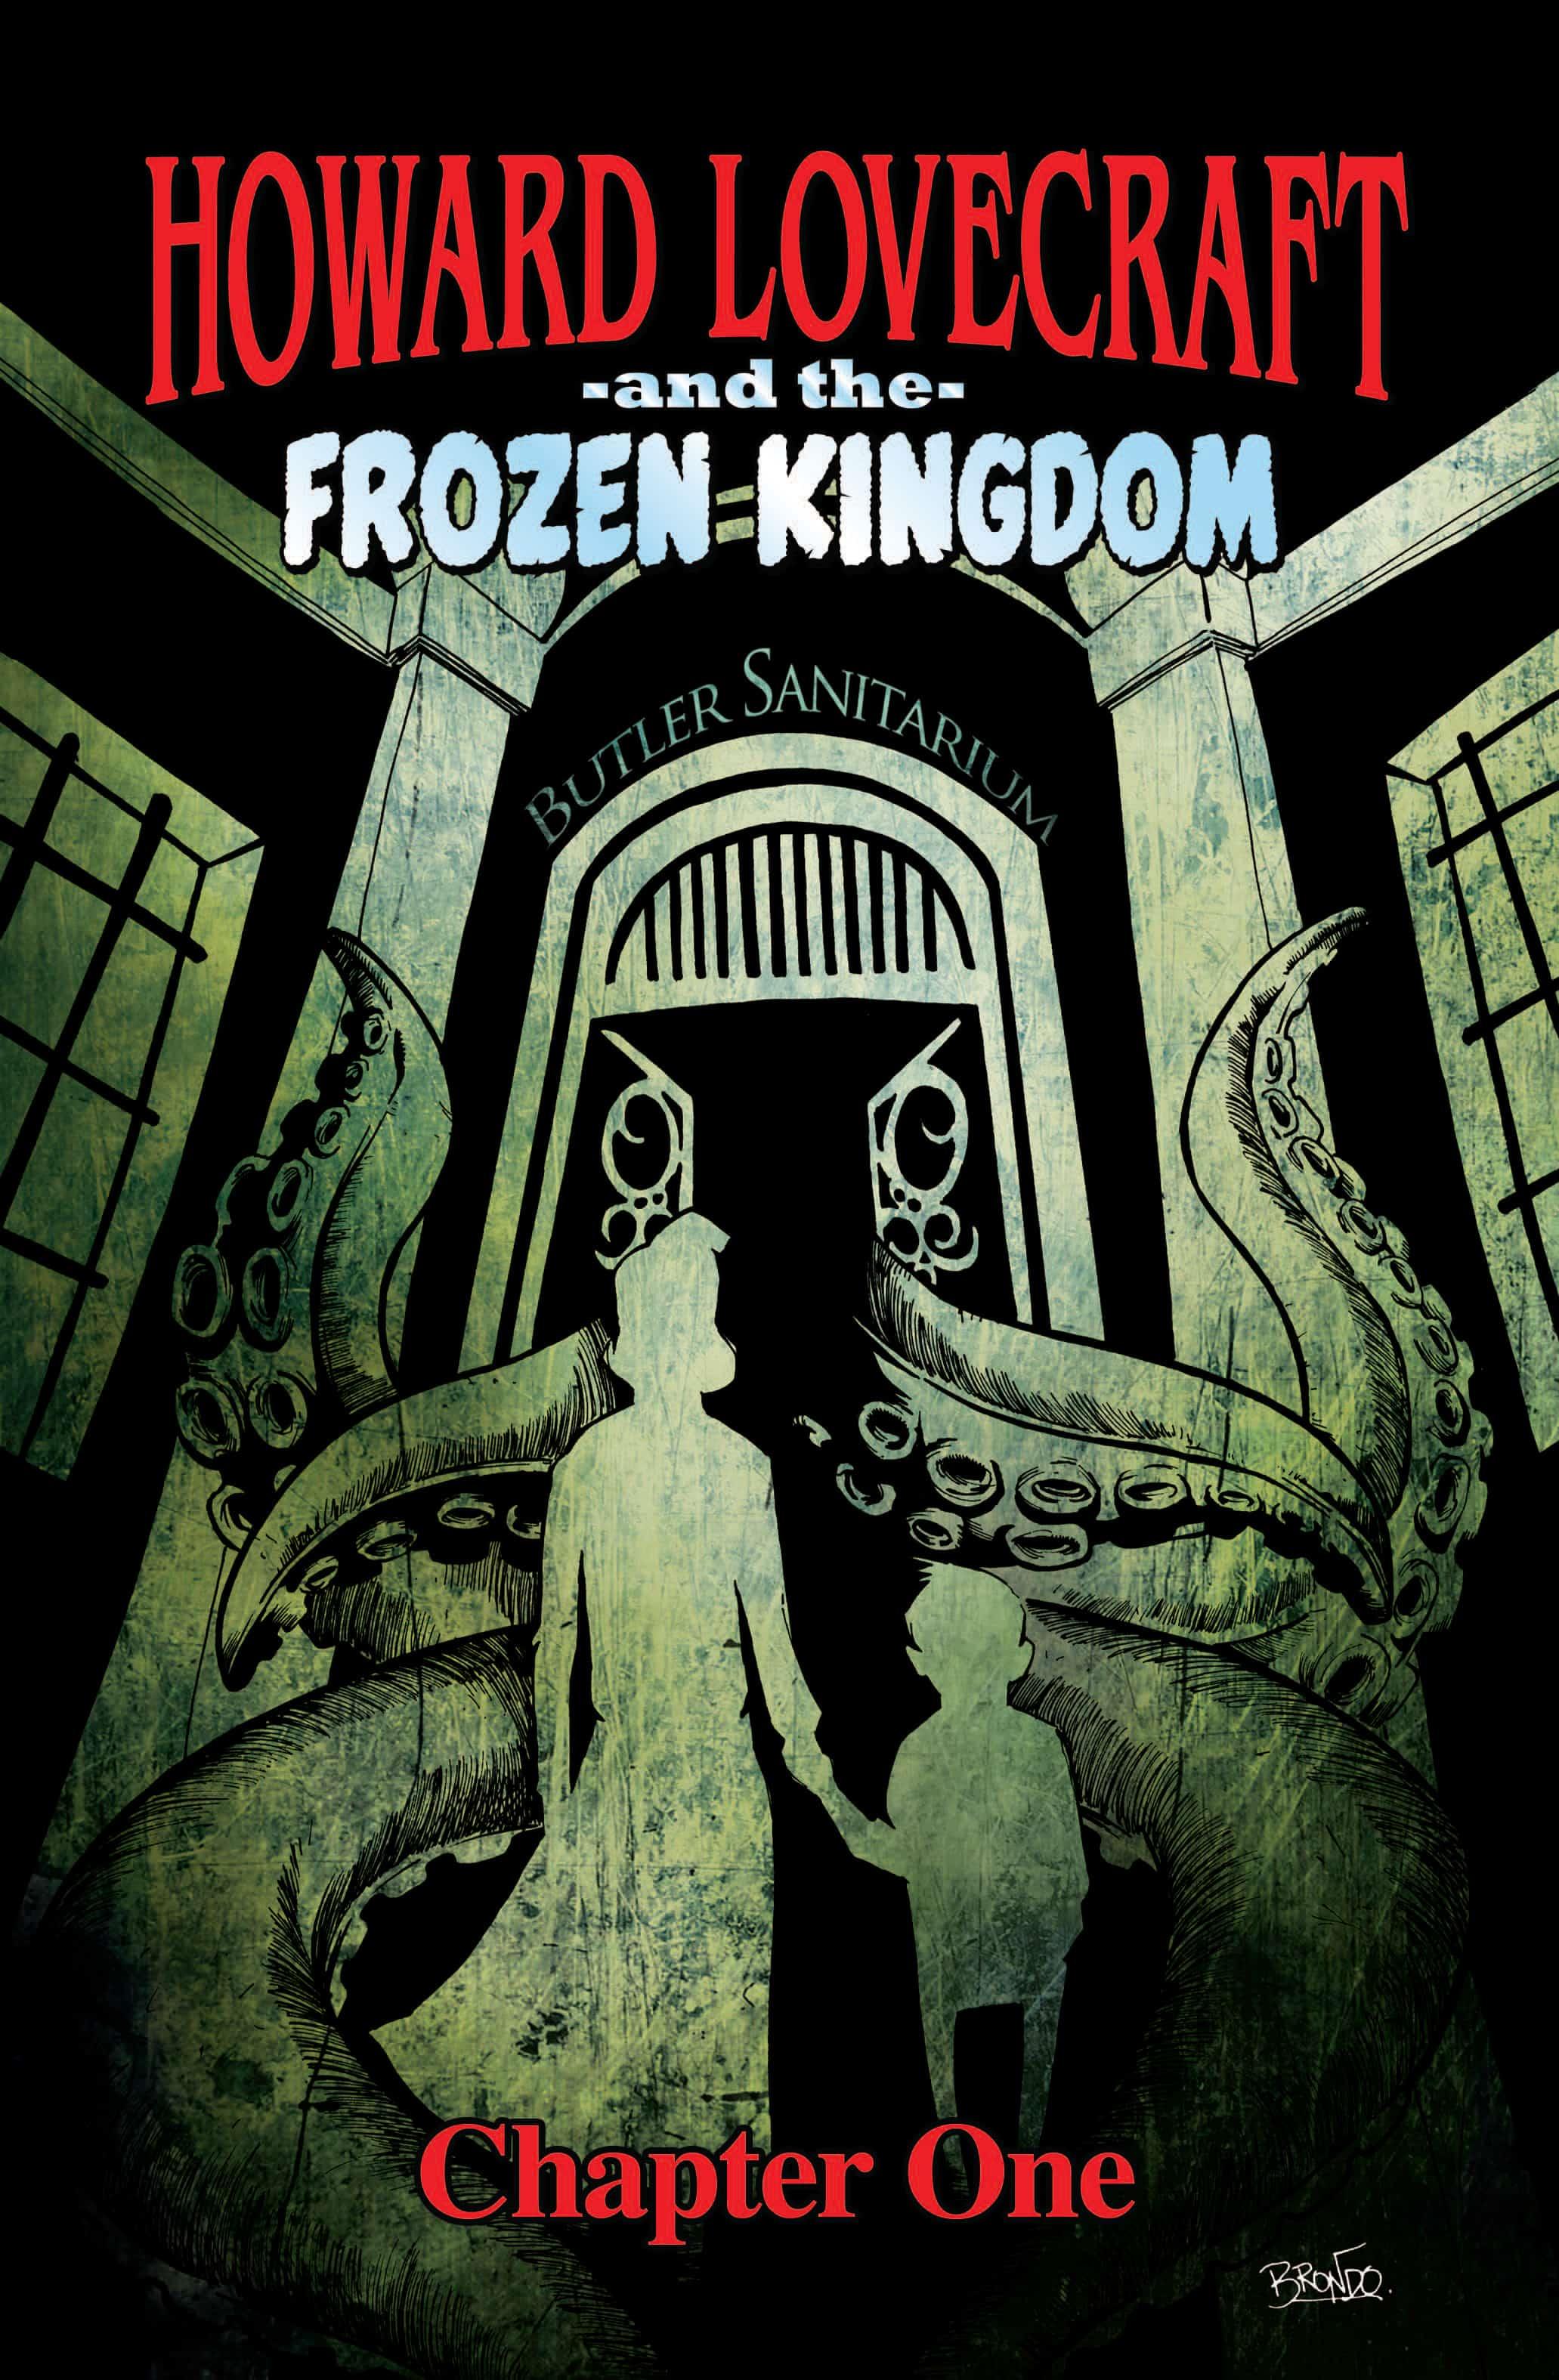 Howard_Lovecraft_Three_Kingdoms-300dpi-6